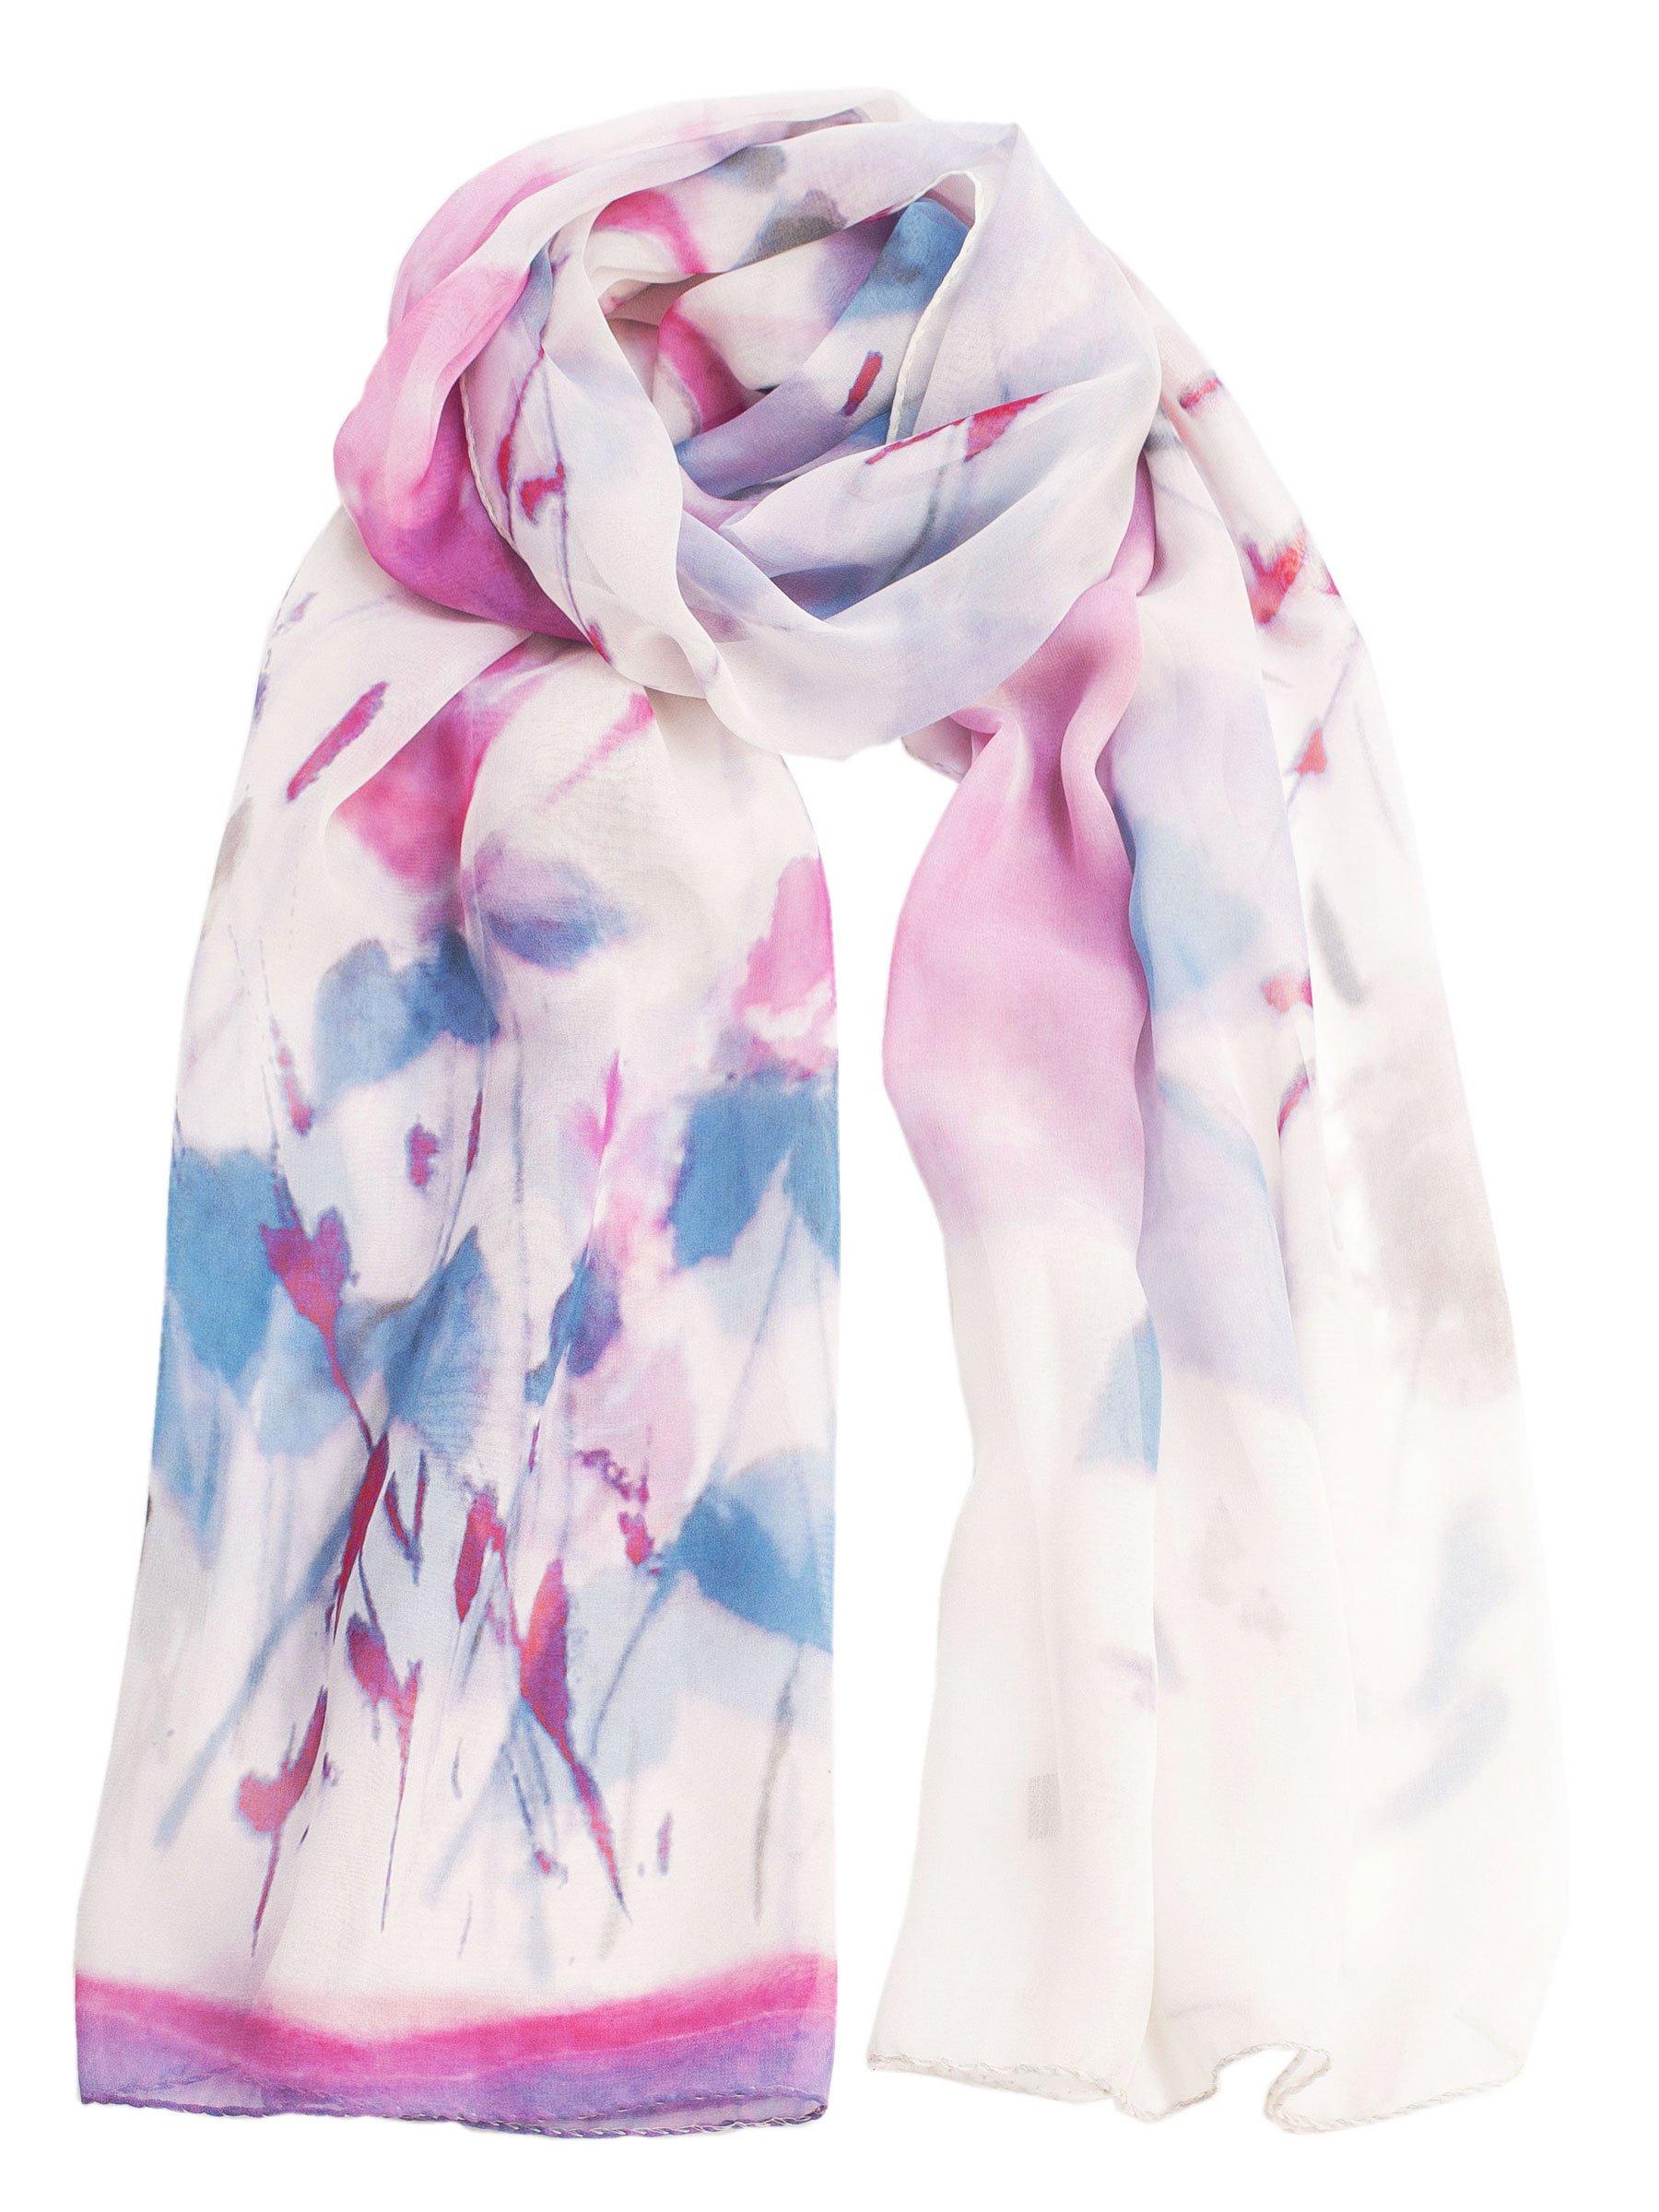 Elizabetta Italian Sheer Silk Chiffon Floral Scarf Evening Wrap, Pink & Lavender